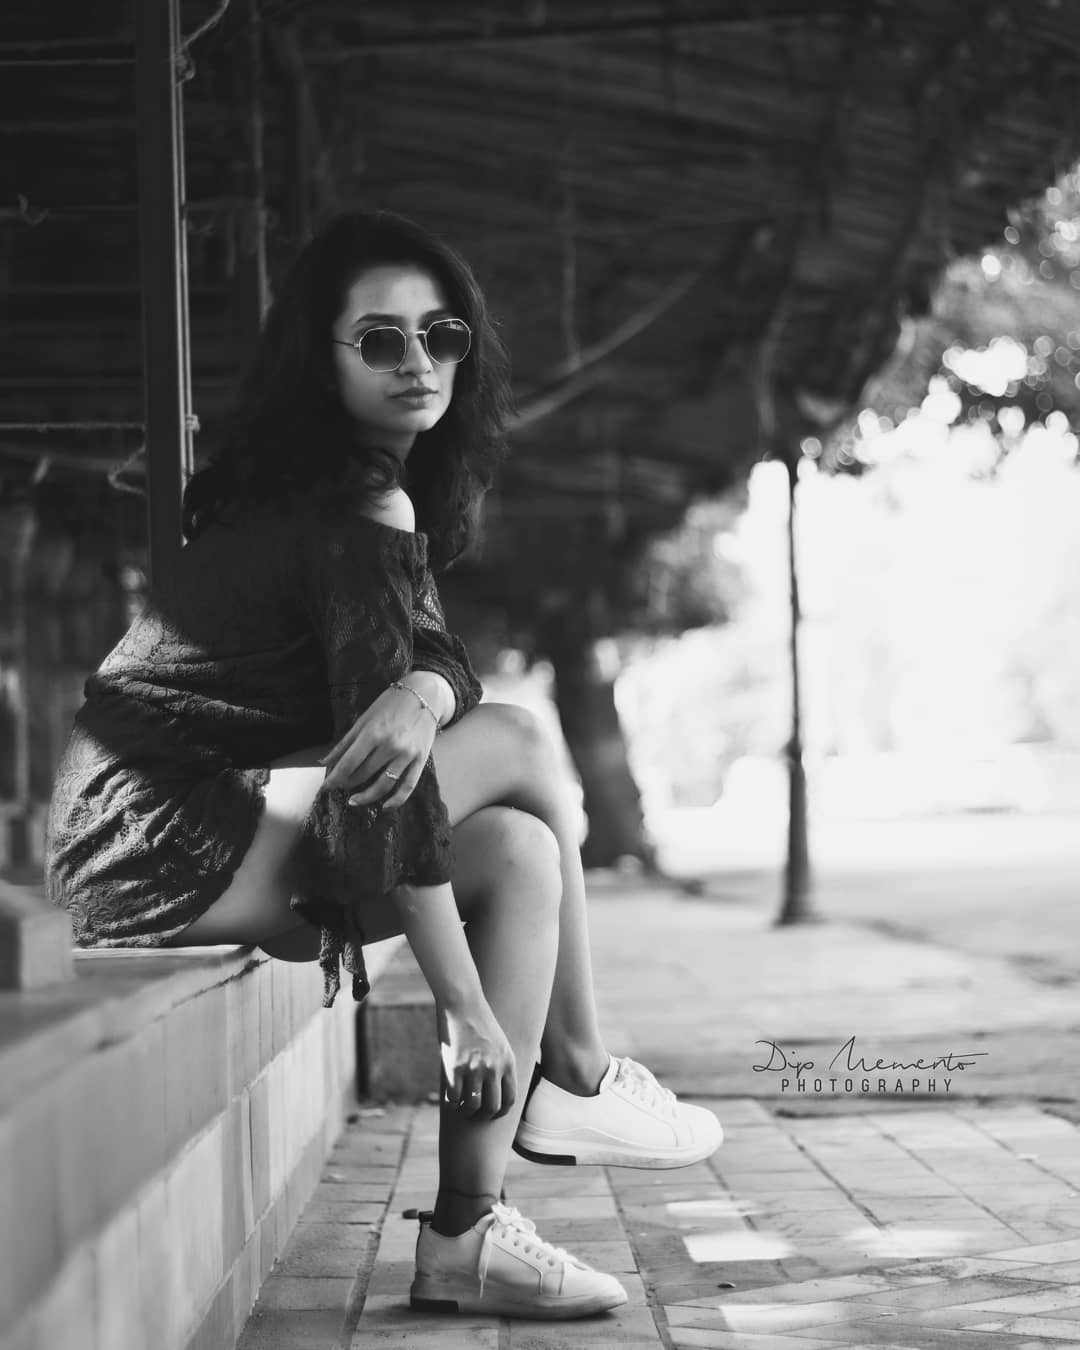 Outdoor summer street  shoot 🕶️☀️🔆🕶️☀️🔆🕶️☀️🔆🕶️☀️🔆 In frame: JUHI @_juhi13 Shoot by : @dipthakkar.clicker @dip_memento_photography 🔆☀️🕶️🔆☀️🕶️🔆☀️🕶️🔆☀️🕶️ #portrait #portraitphotography #portraitmood #portrait_perfection #portraitpage #portrait_vision #portrait_shots #portrait_ig #moodyports #portraits #portraiture #photography #pursuitofportraits #portraits_ig #portrait_mood #makeportraits #portraitgames #portrait_star #top_portraits #portraitvision #discoverportrait #portraitstream #portrait_universe #portrait_planet #portrait_mf #photooftheday #portrait_shot #model #portrait_today #portraitphotographer